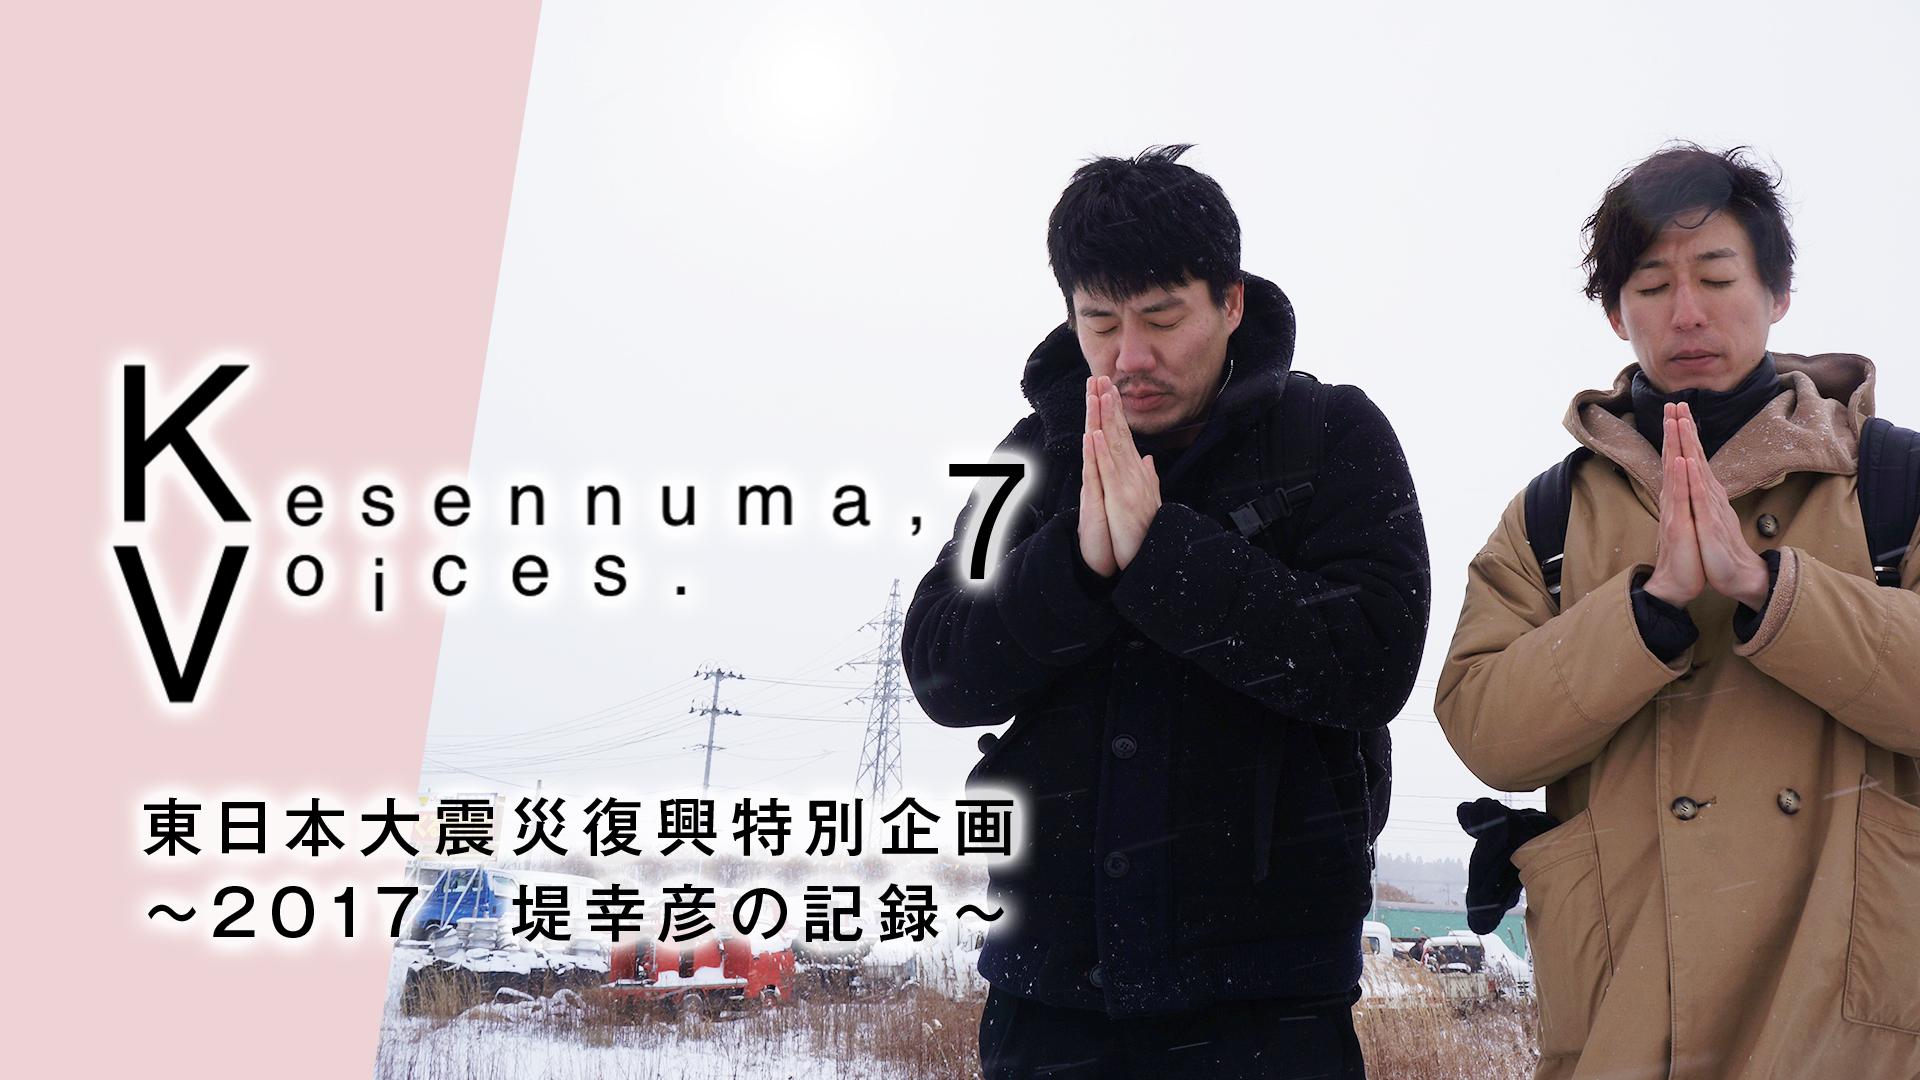 Kesennuma,Voices.7 東日本大震災復興特別企画~2017 堤幸彦の記録~